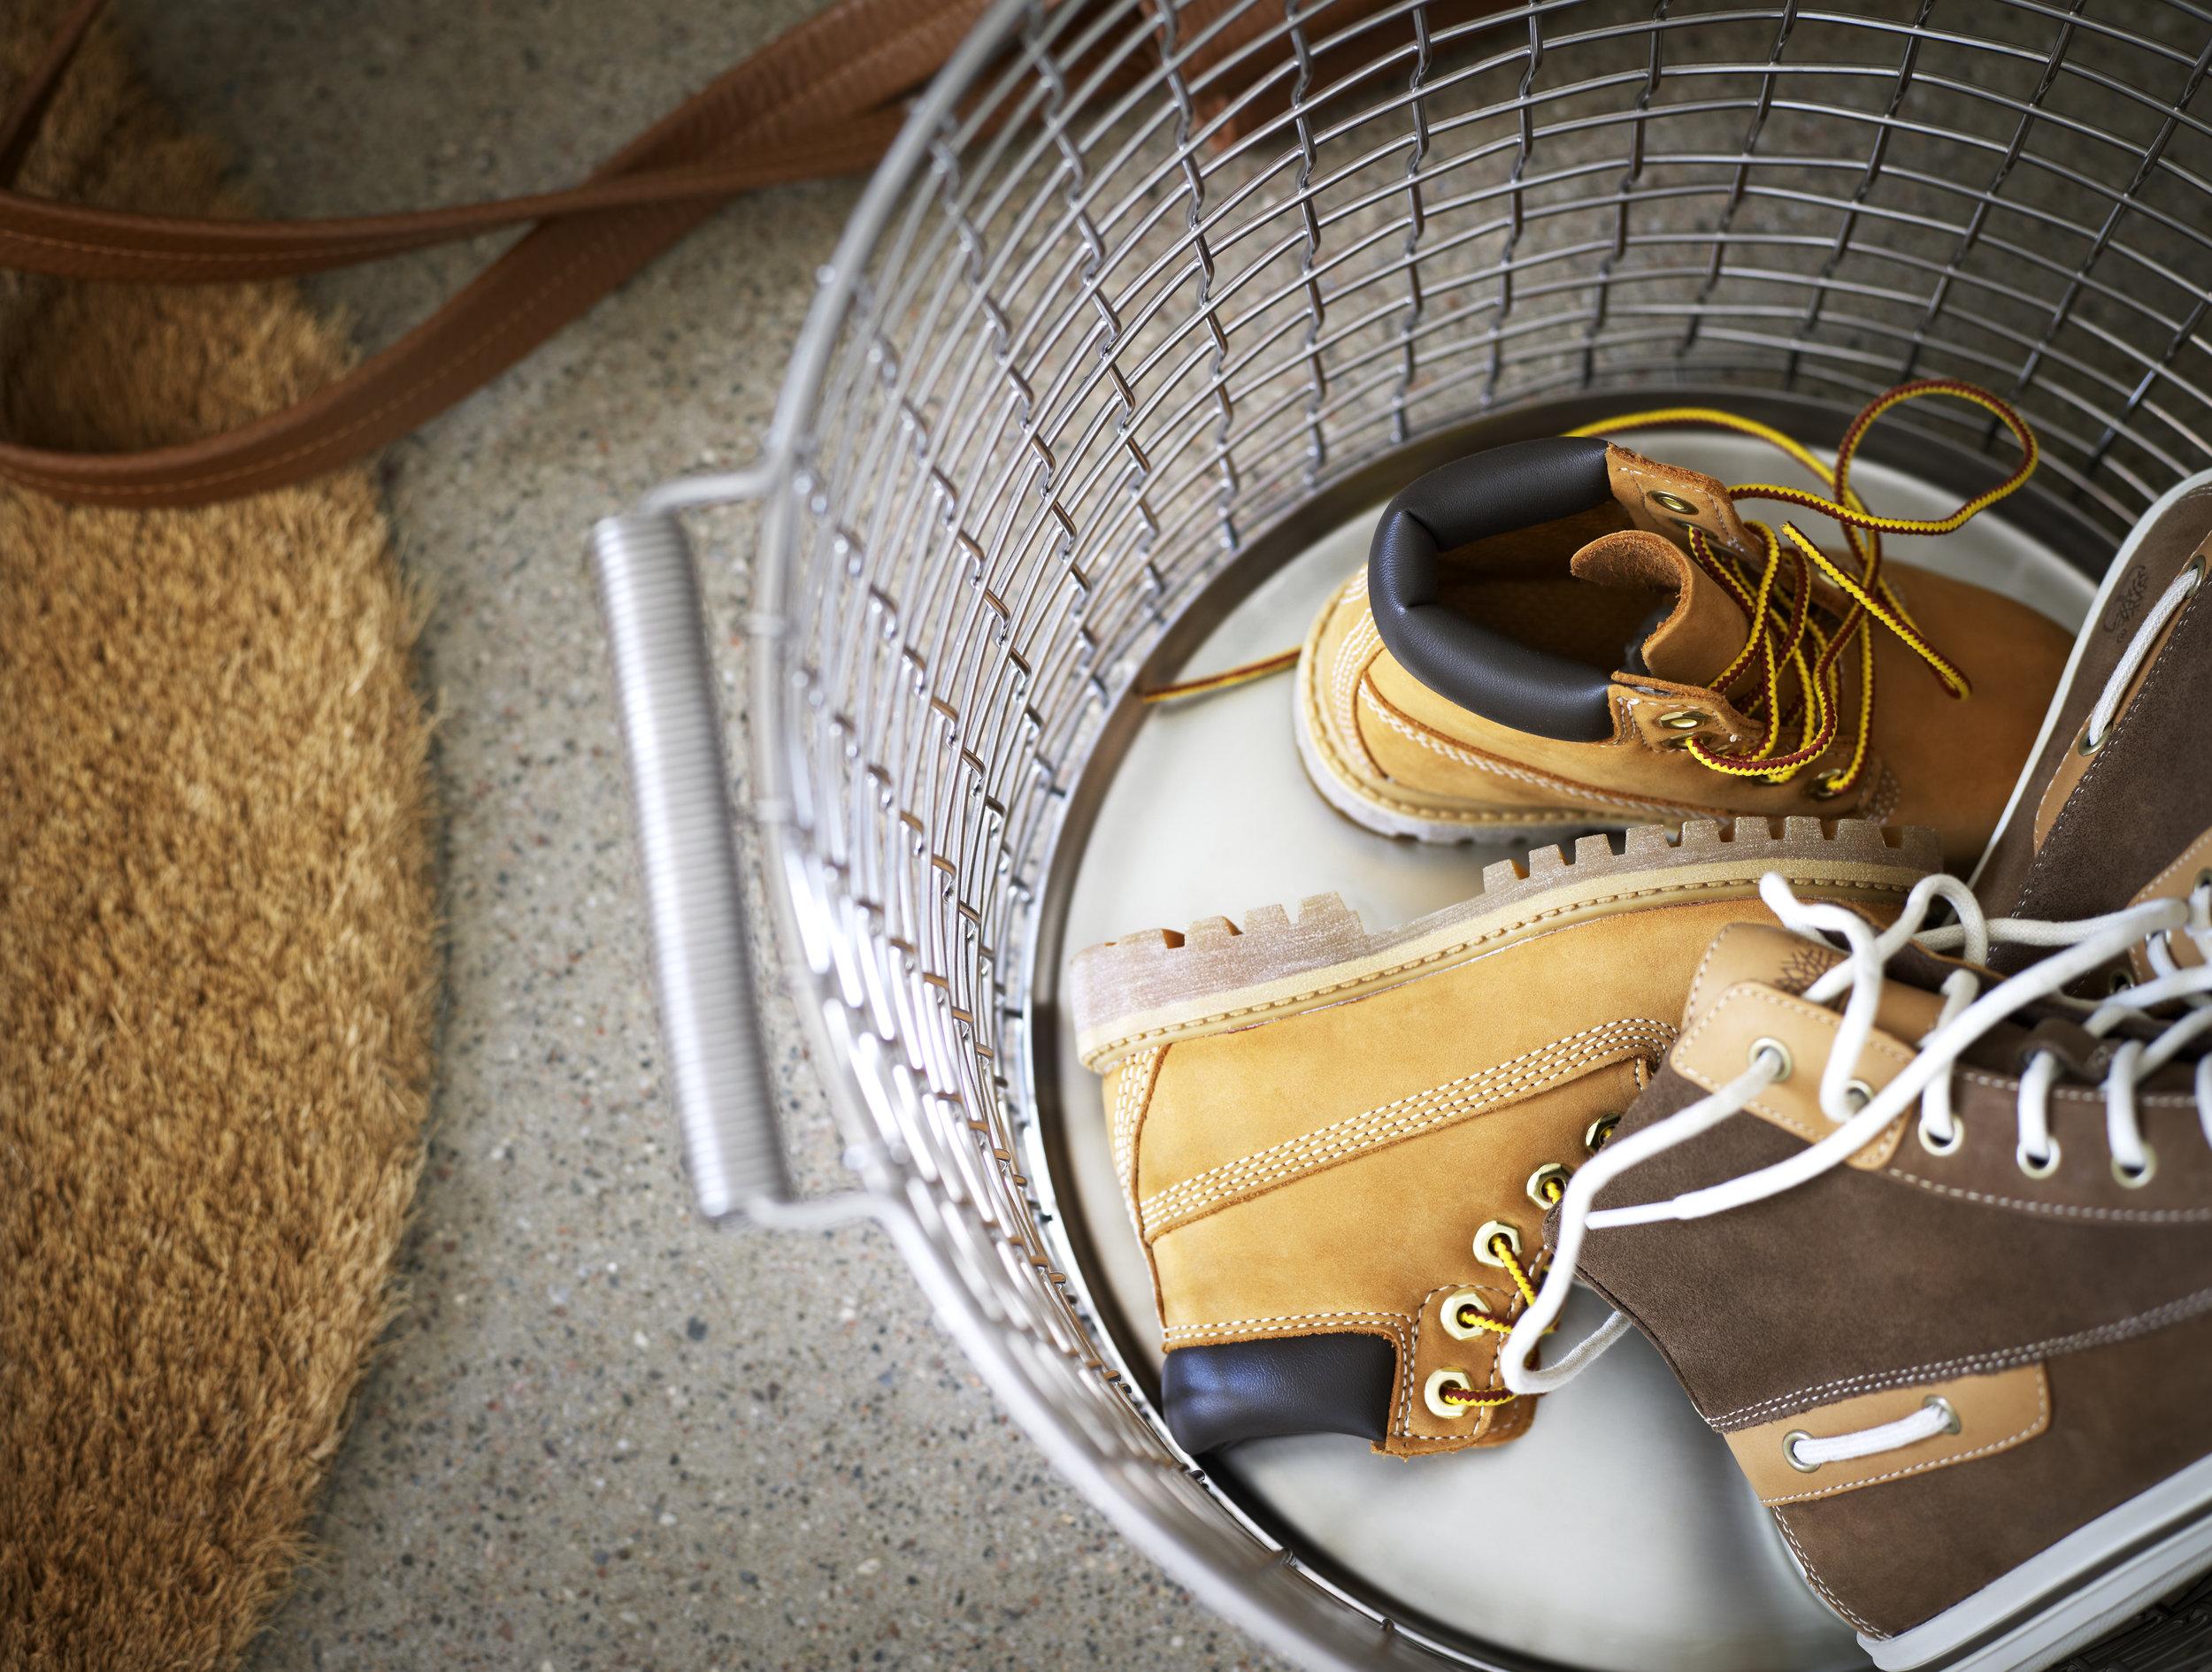 Shoes basket Bucket 24 & Bottom plate